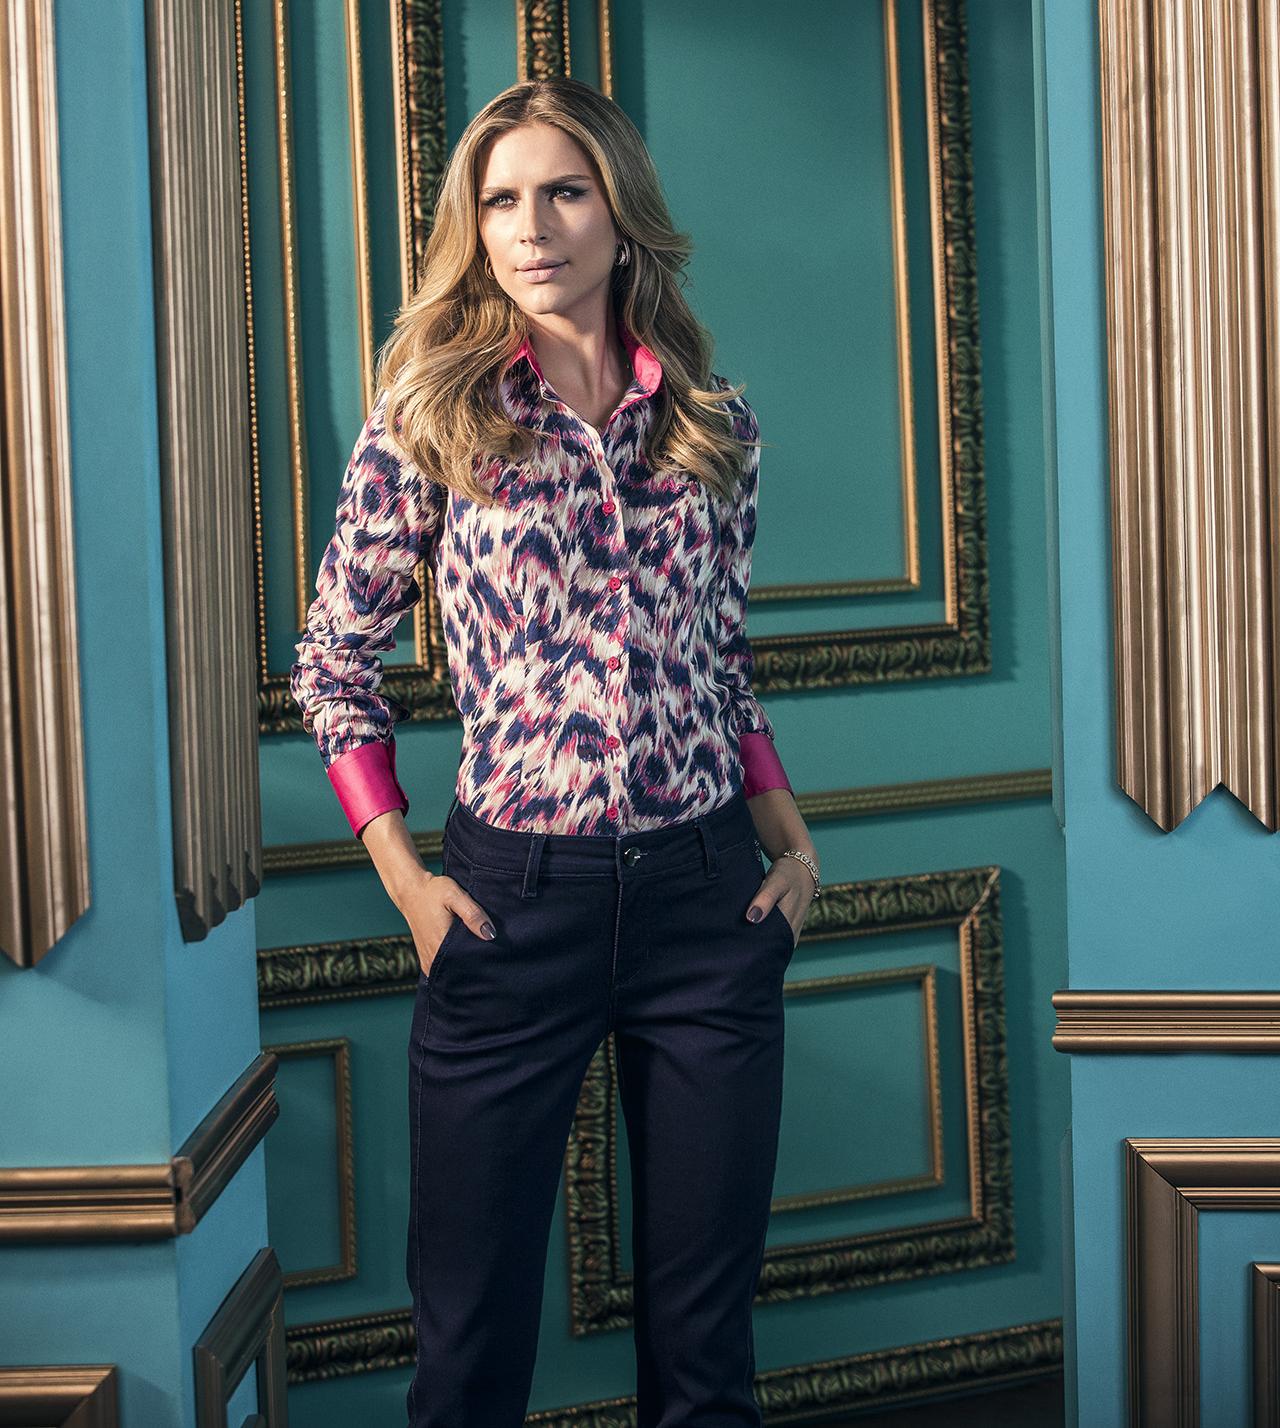 c03c6899d2 camisa dudalina feminina estampada 6 - Revista das dicasRevista das ...